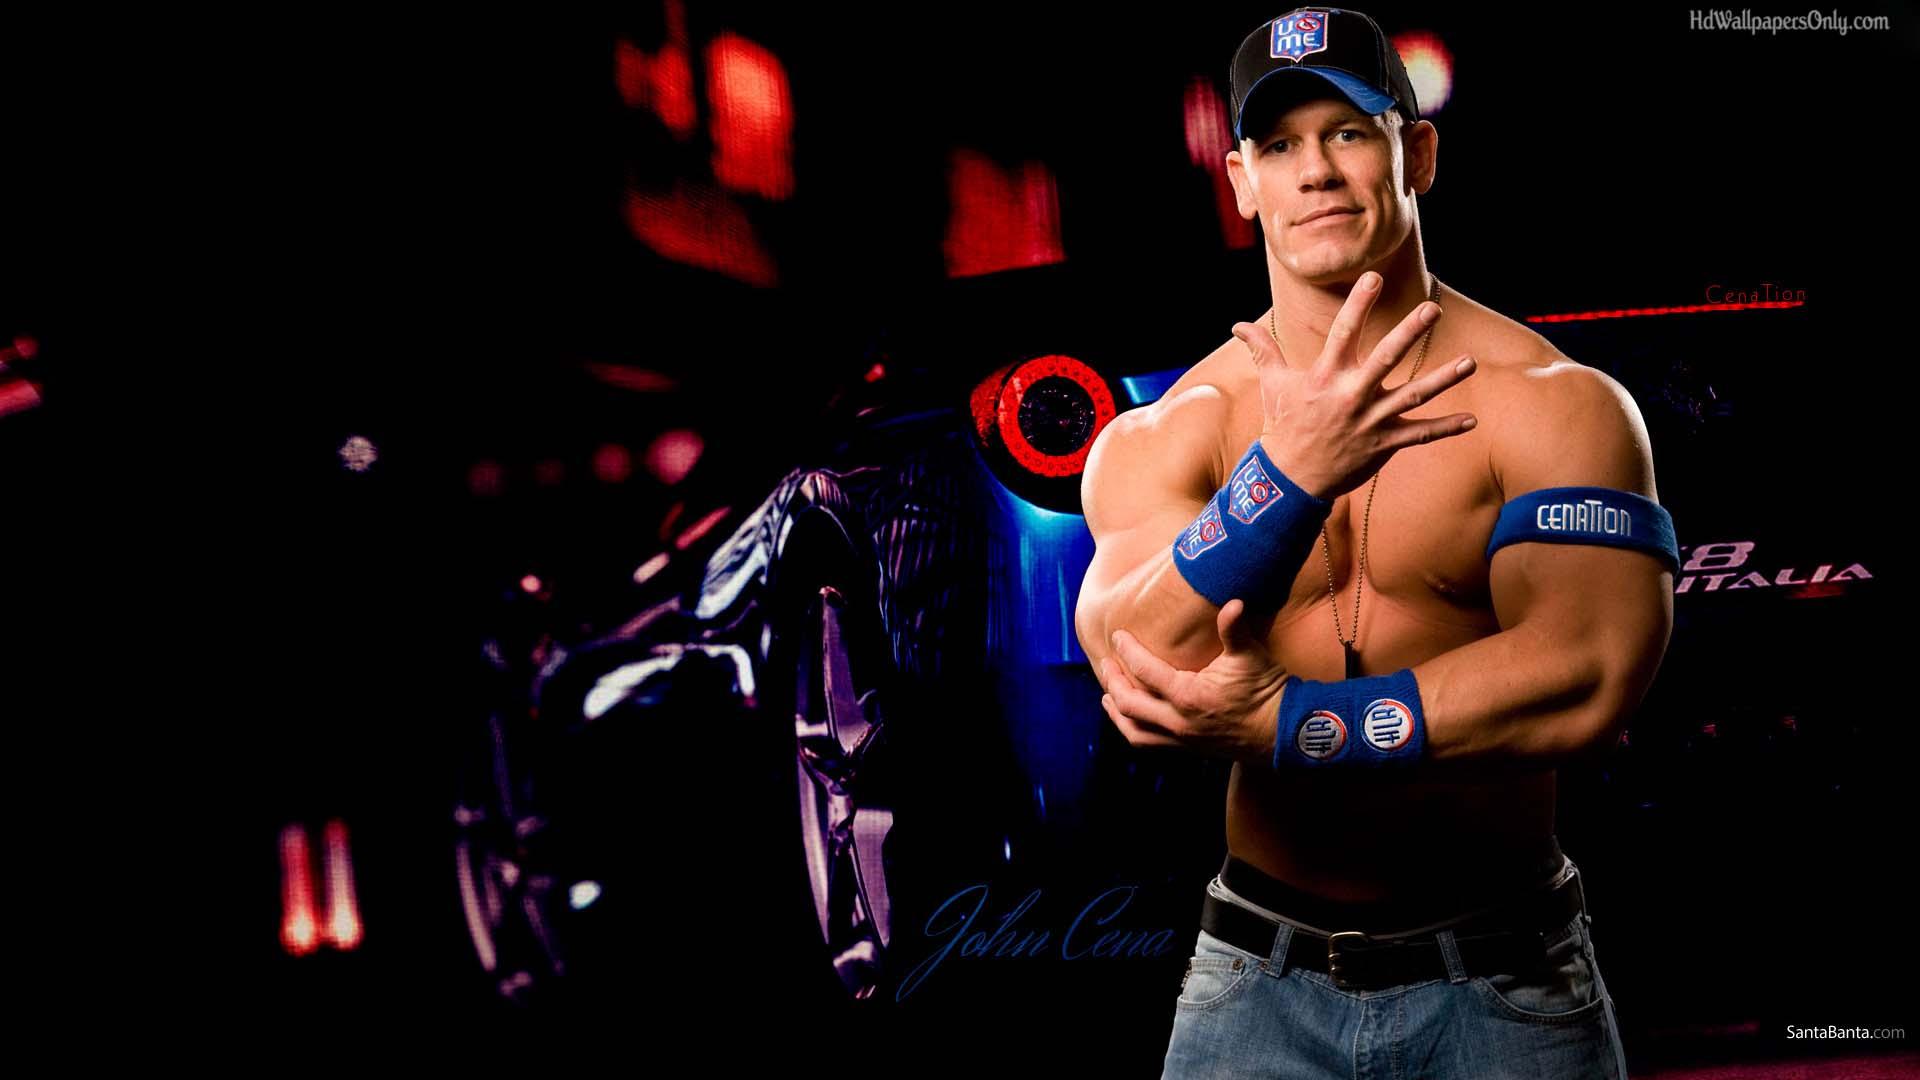 John-Cena-must-downloads-wallpaper-wp3407626